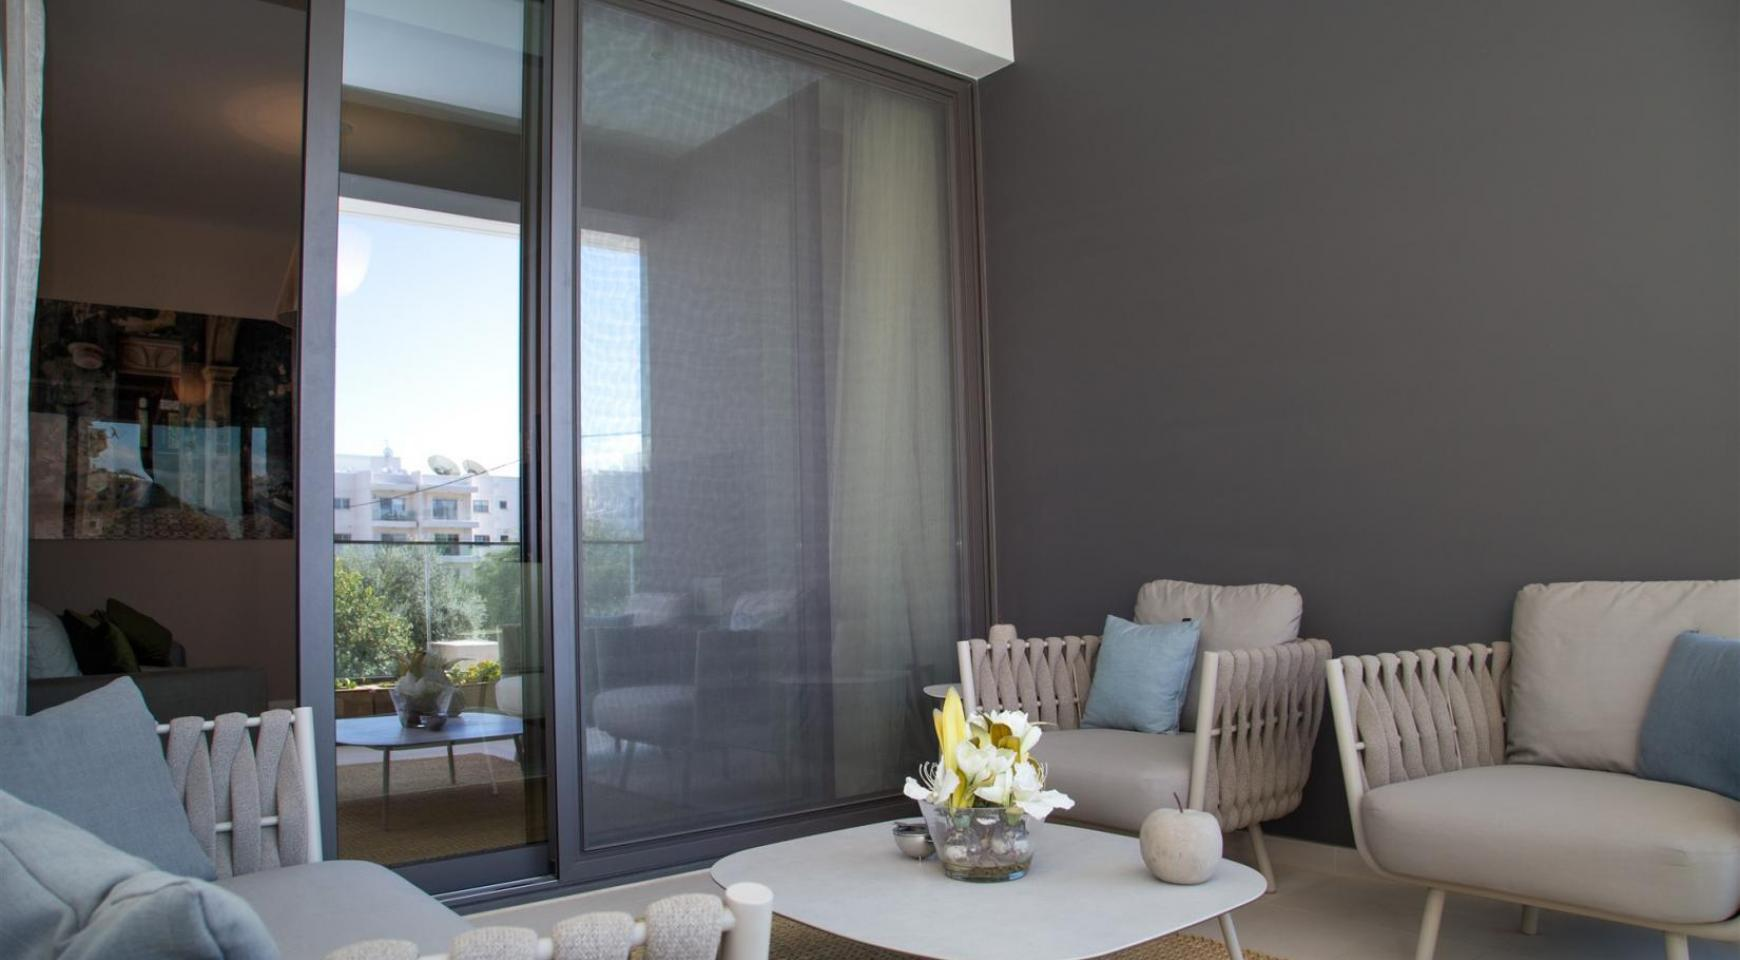 Malibu Residence. Πολυτελές ρετιρέ 3 υπνοδωματίων  402 με ιδιωτική πισίνα - 25